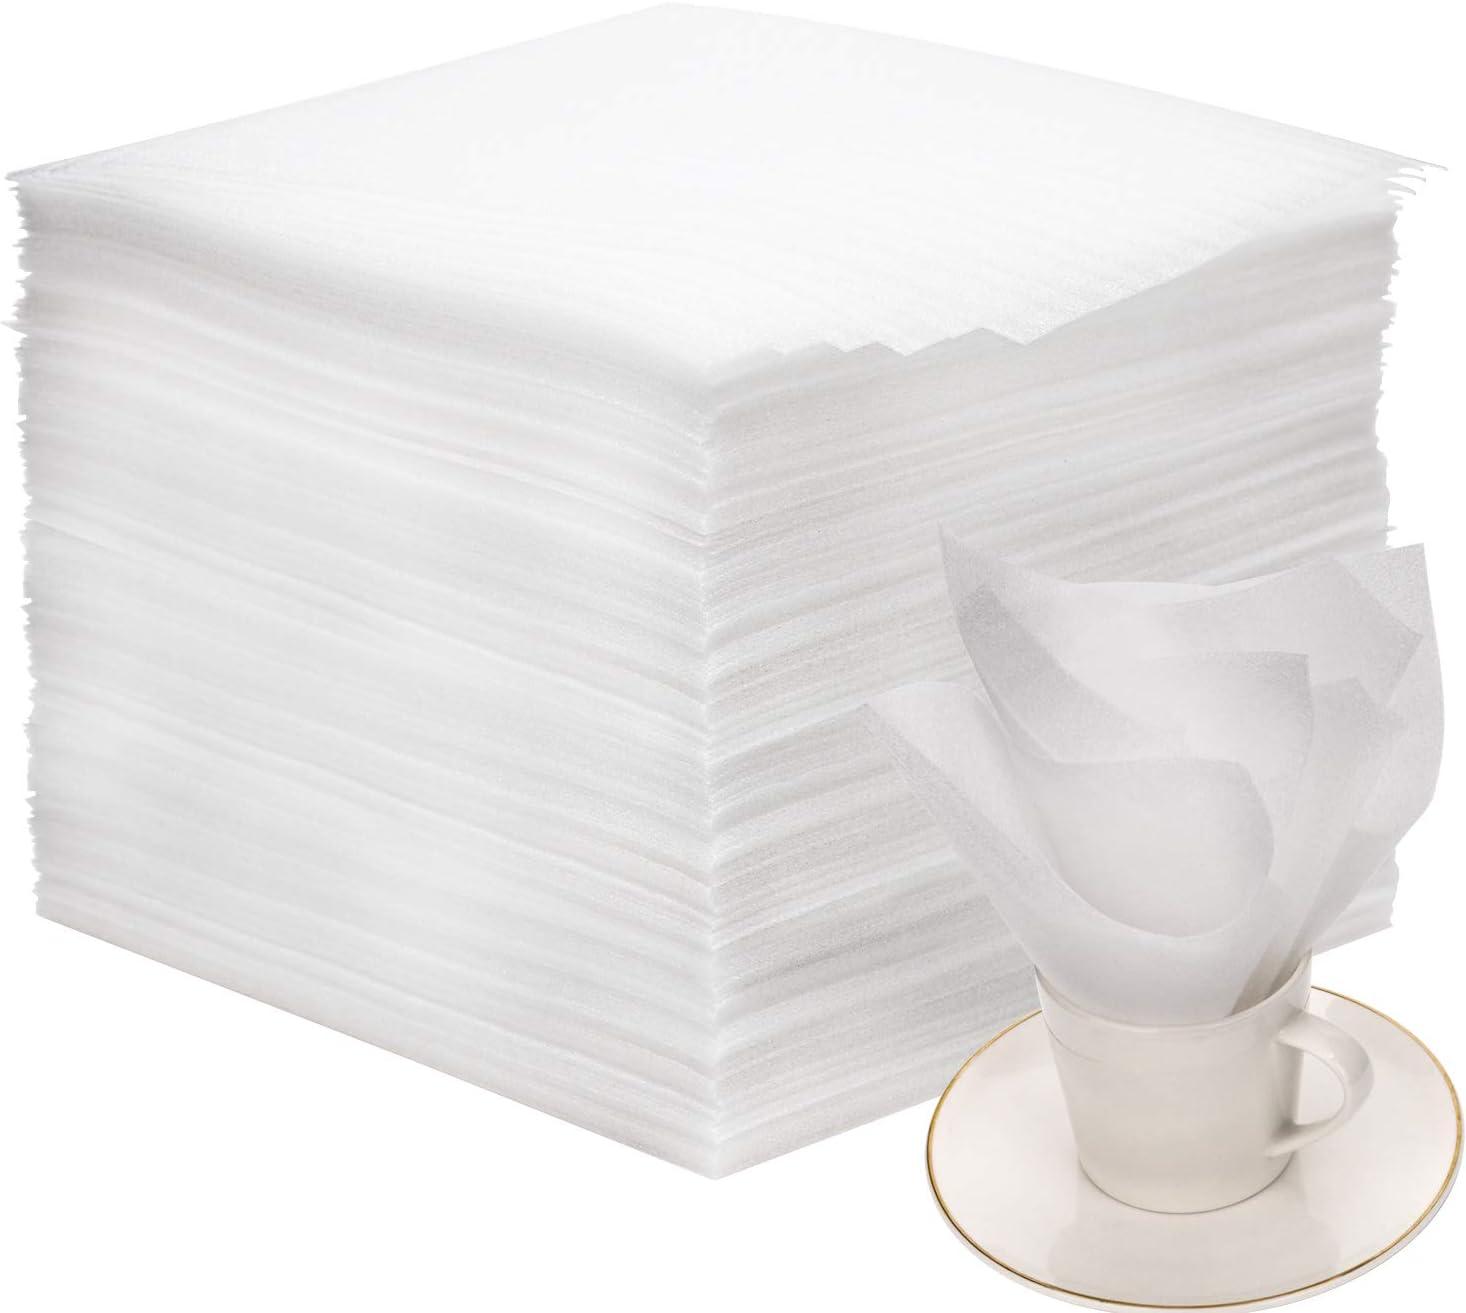 AIEX 80 Piezas Espuma de Embalaje Espuma Hojas Foam Sheet Envoltura de Espuma para Platos, platos, vasos, tazas(12x12x0.05 Pulgada)